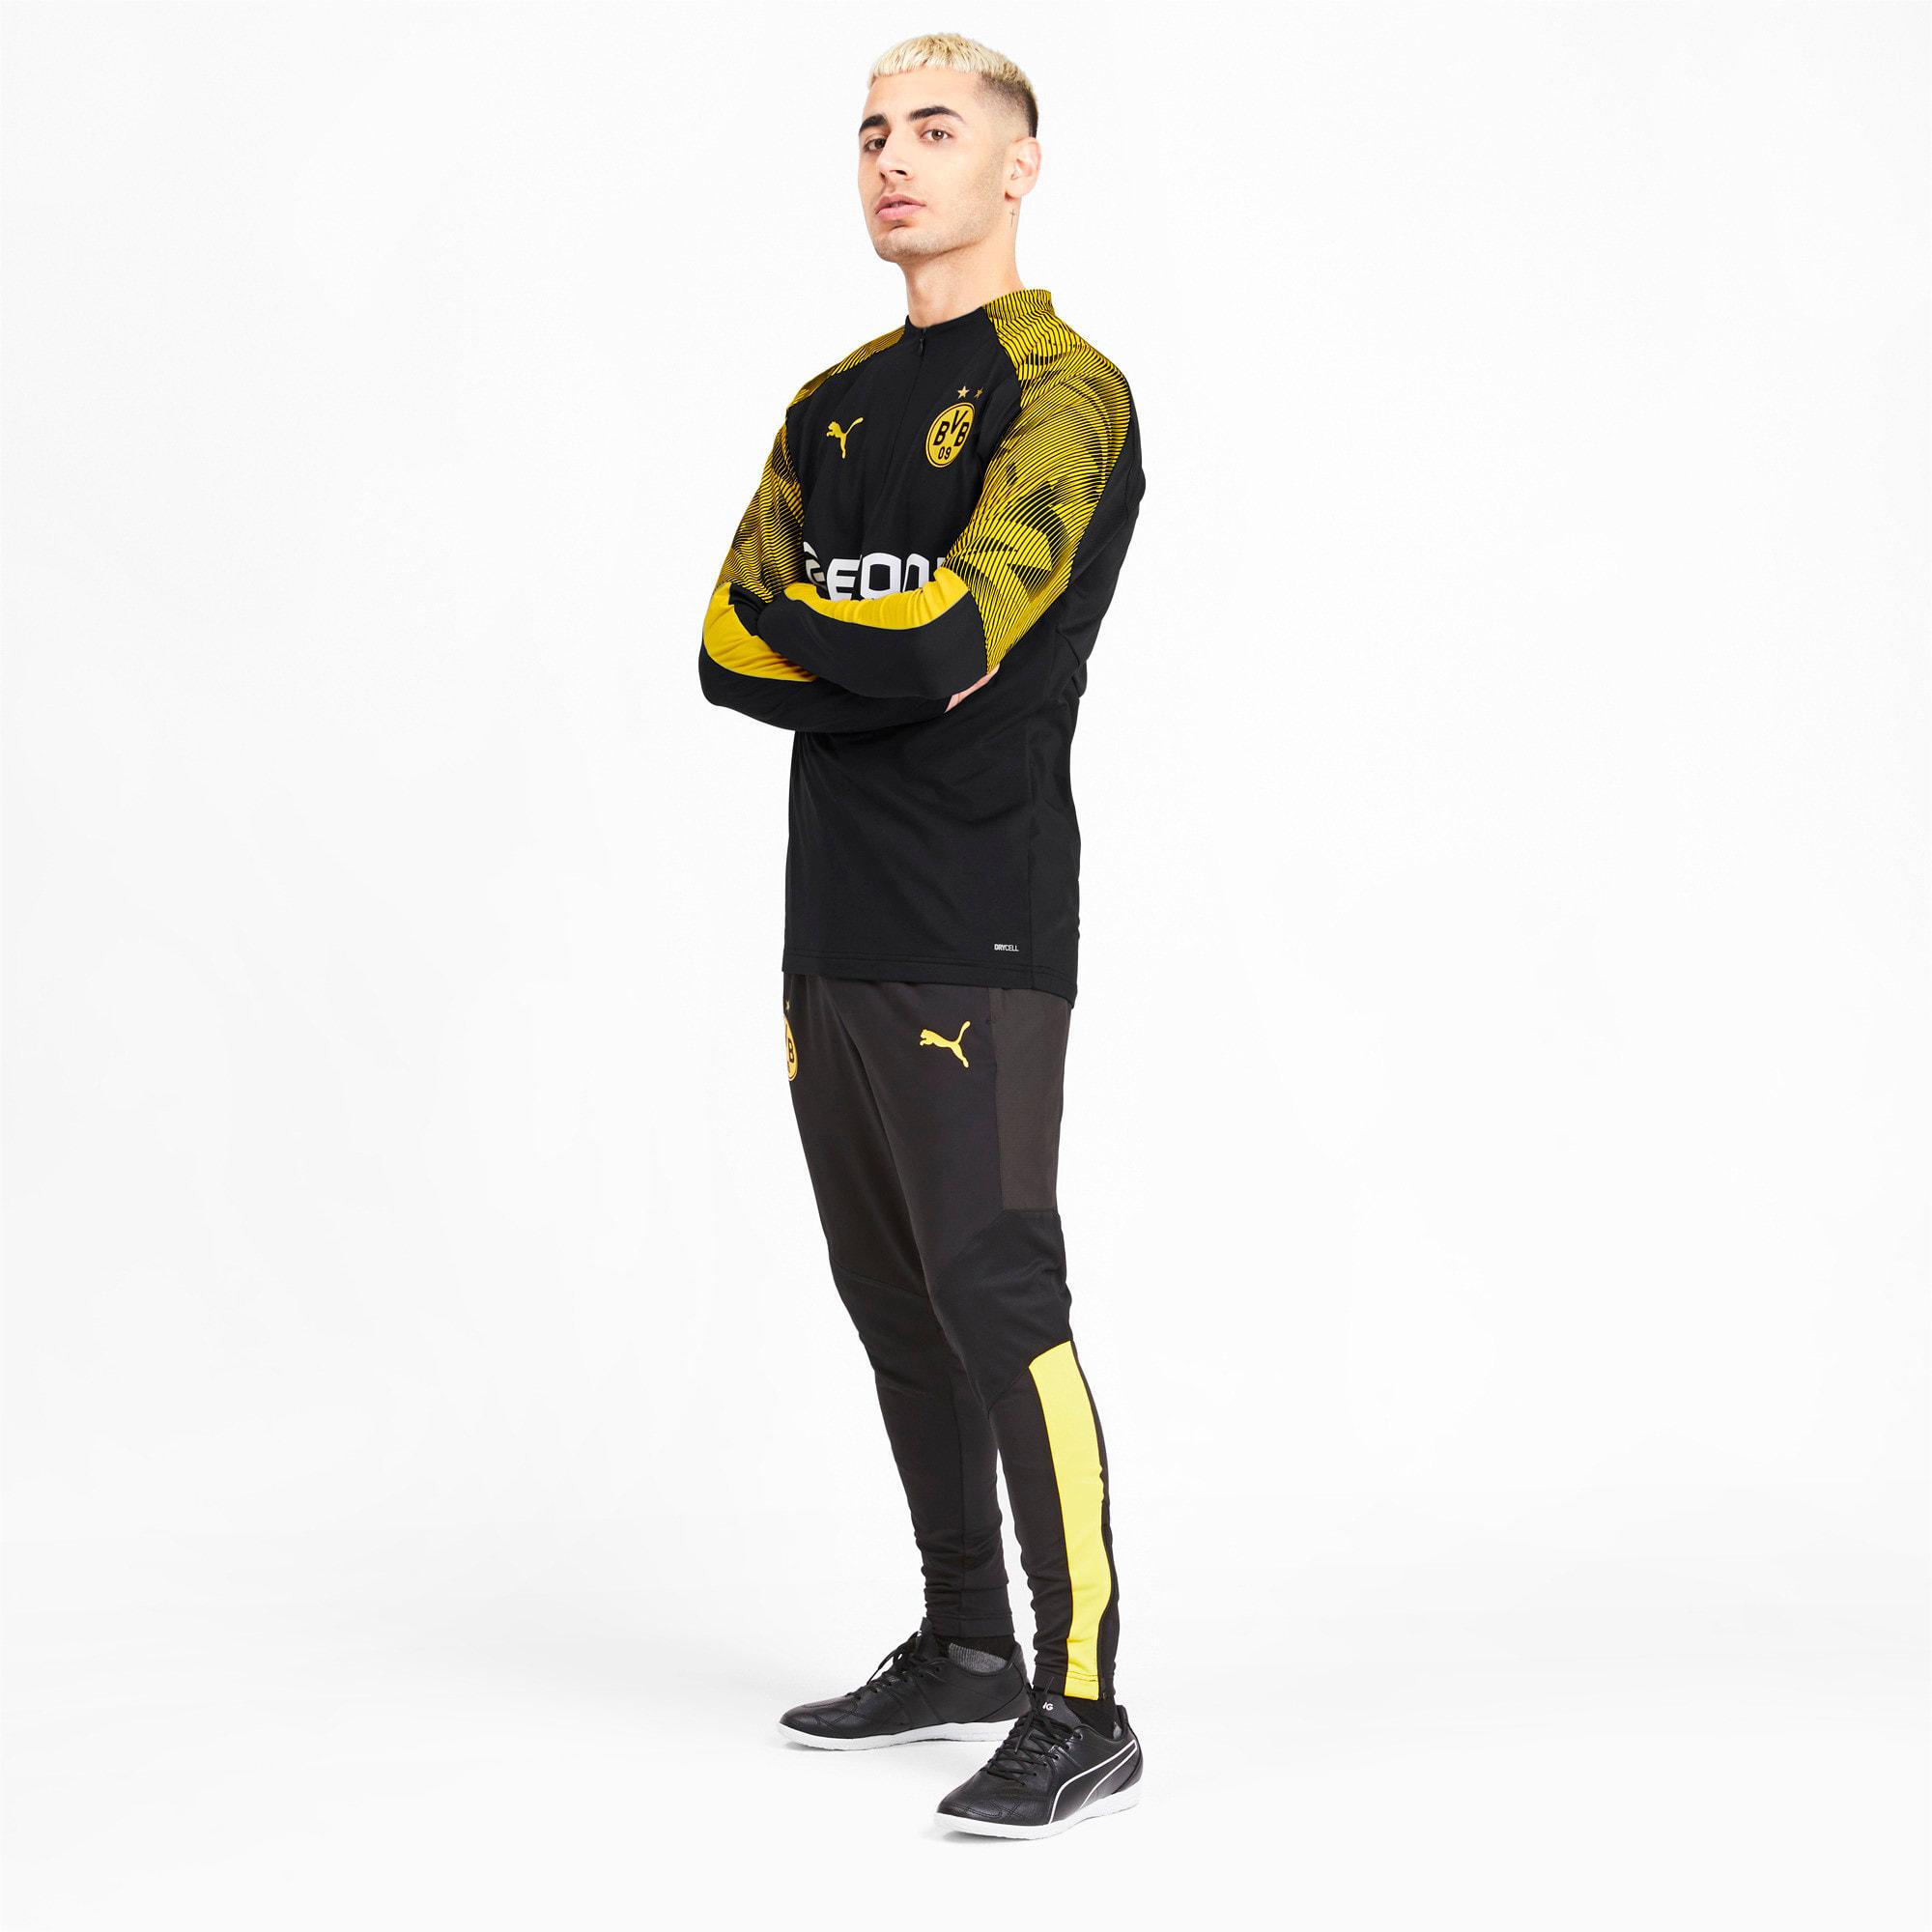 Thumbnail 3 of BVB Men's 1/4 Zip Training Top, Puma Black-Cyber Yellow, medium